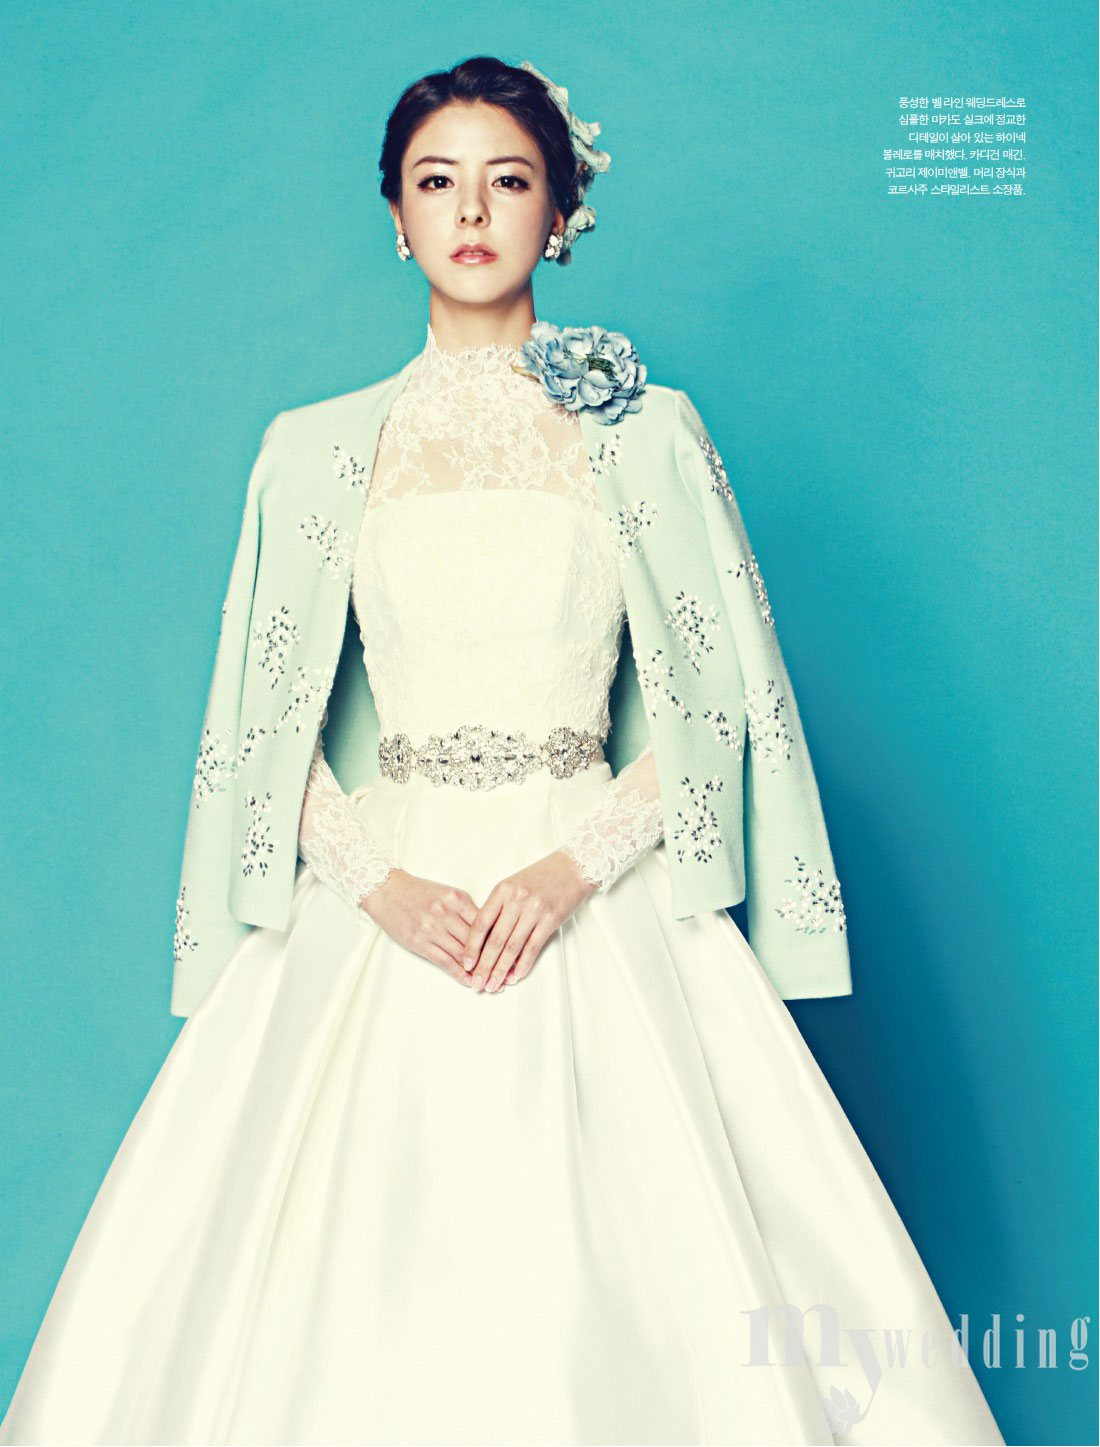 mina-fujii-wedding-magazine-6